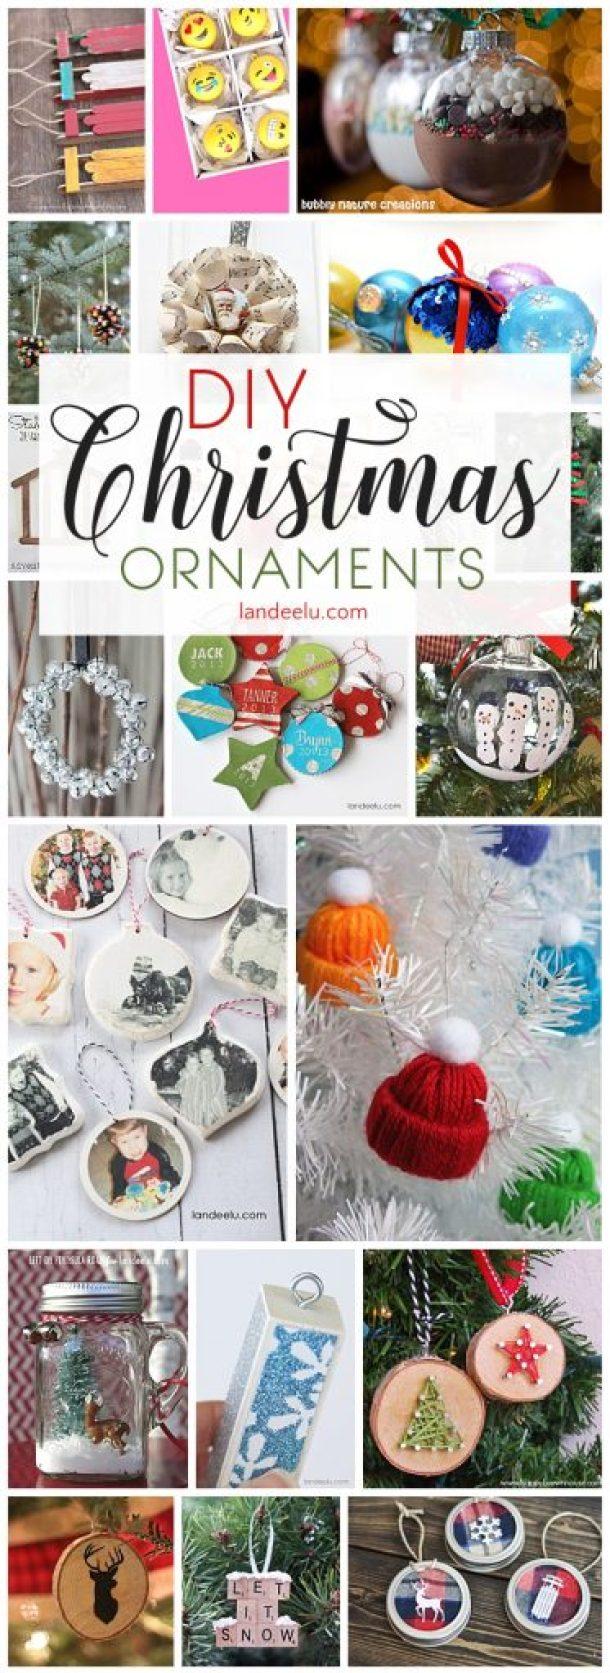 Diy christmas tree ornaments to make landeelu have a beautiful handmade christmas with these diy christmas ornaments solutioingenieria Images